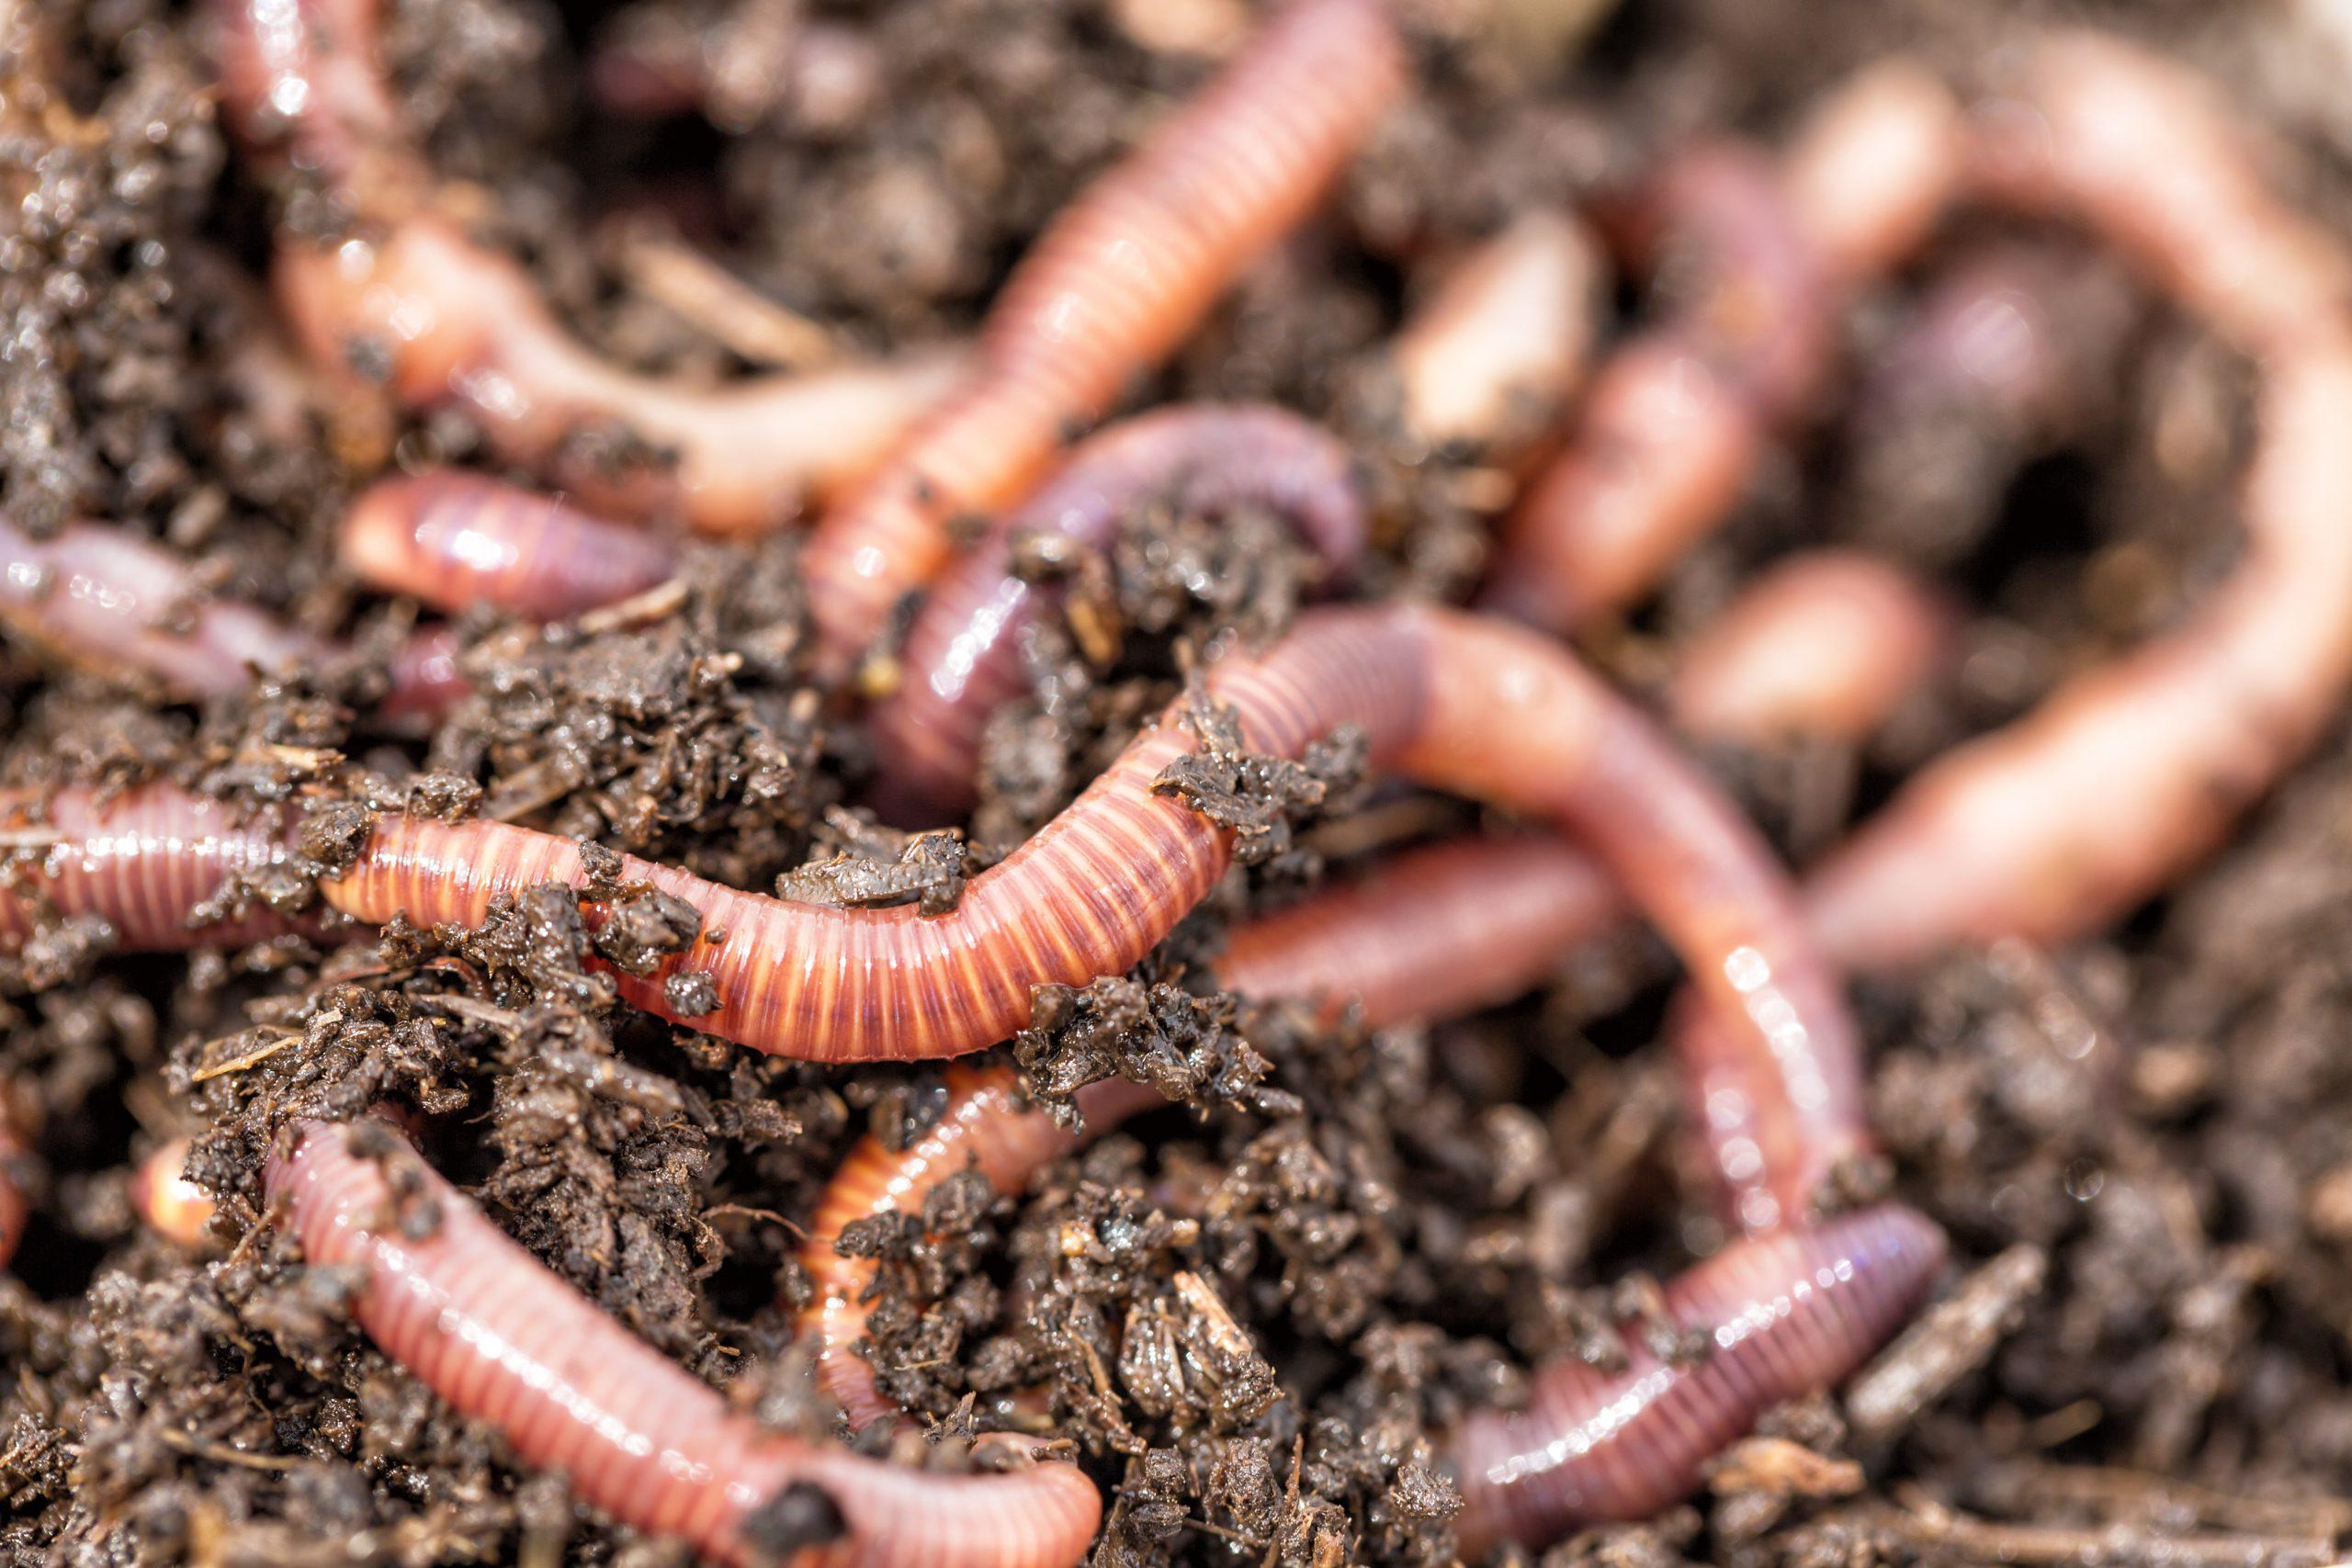 Earthworms inside of a worm habitat.